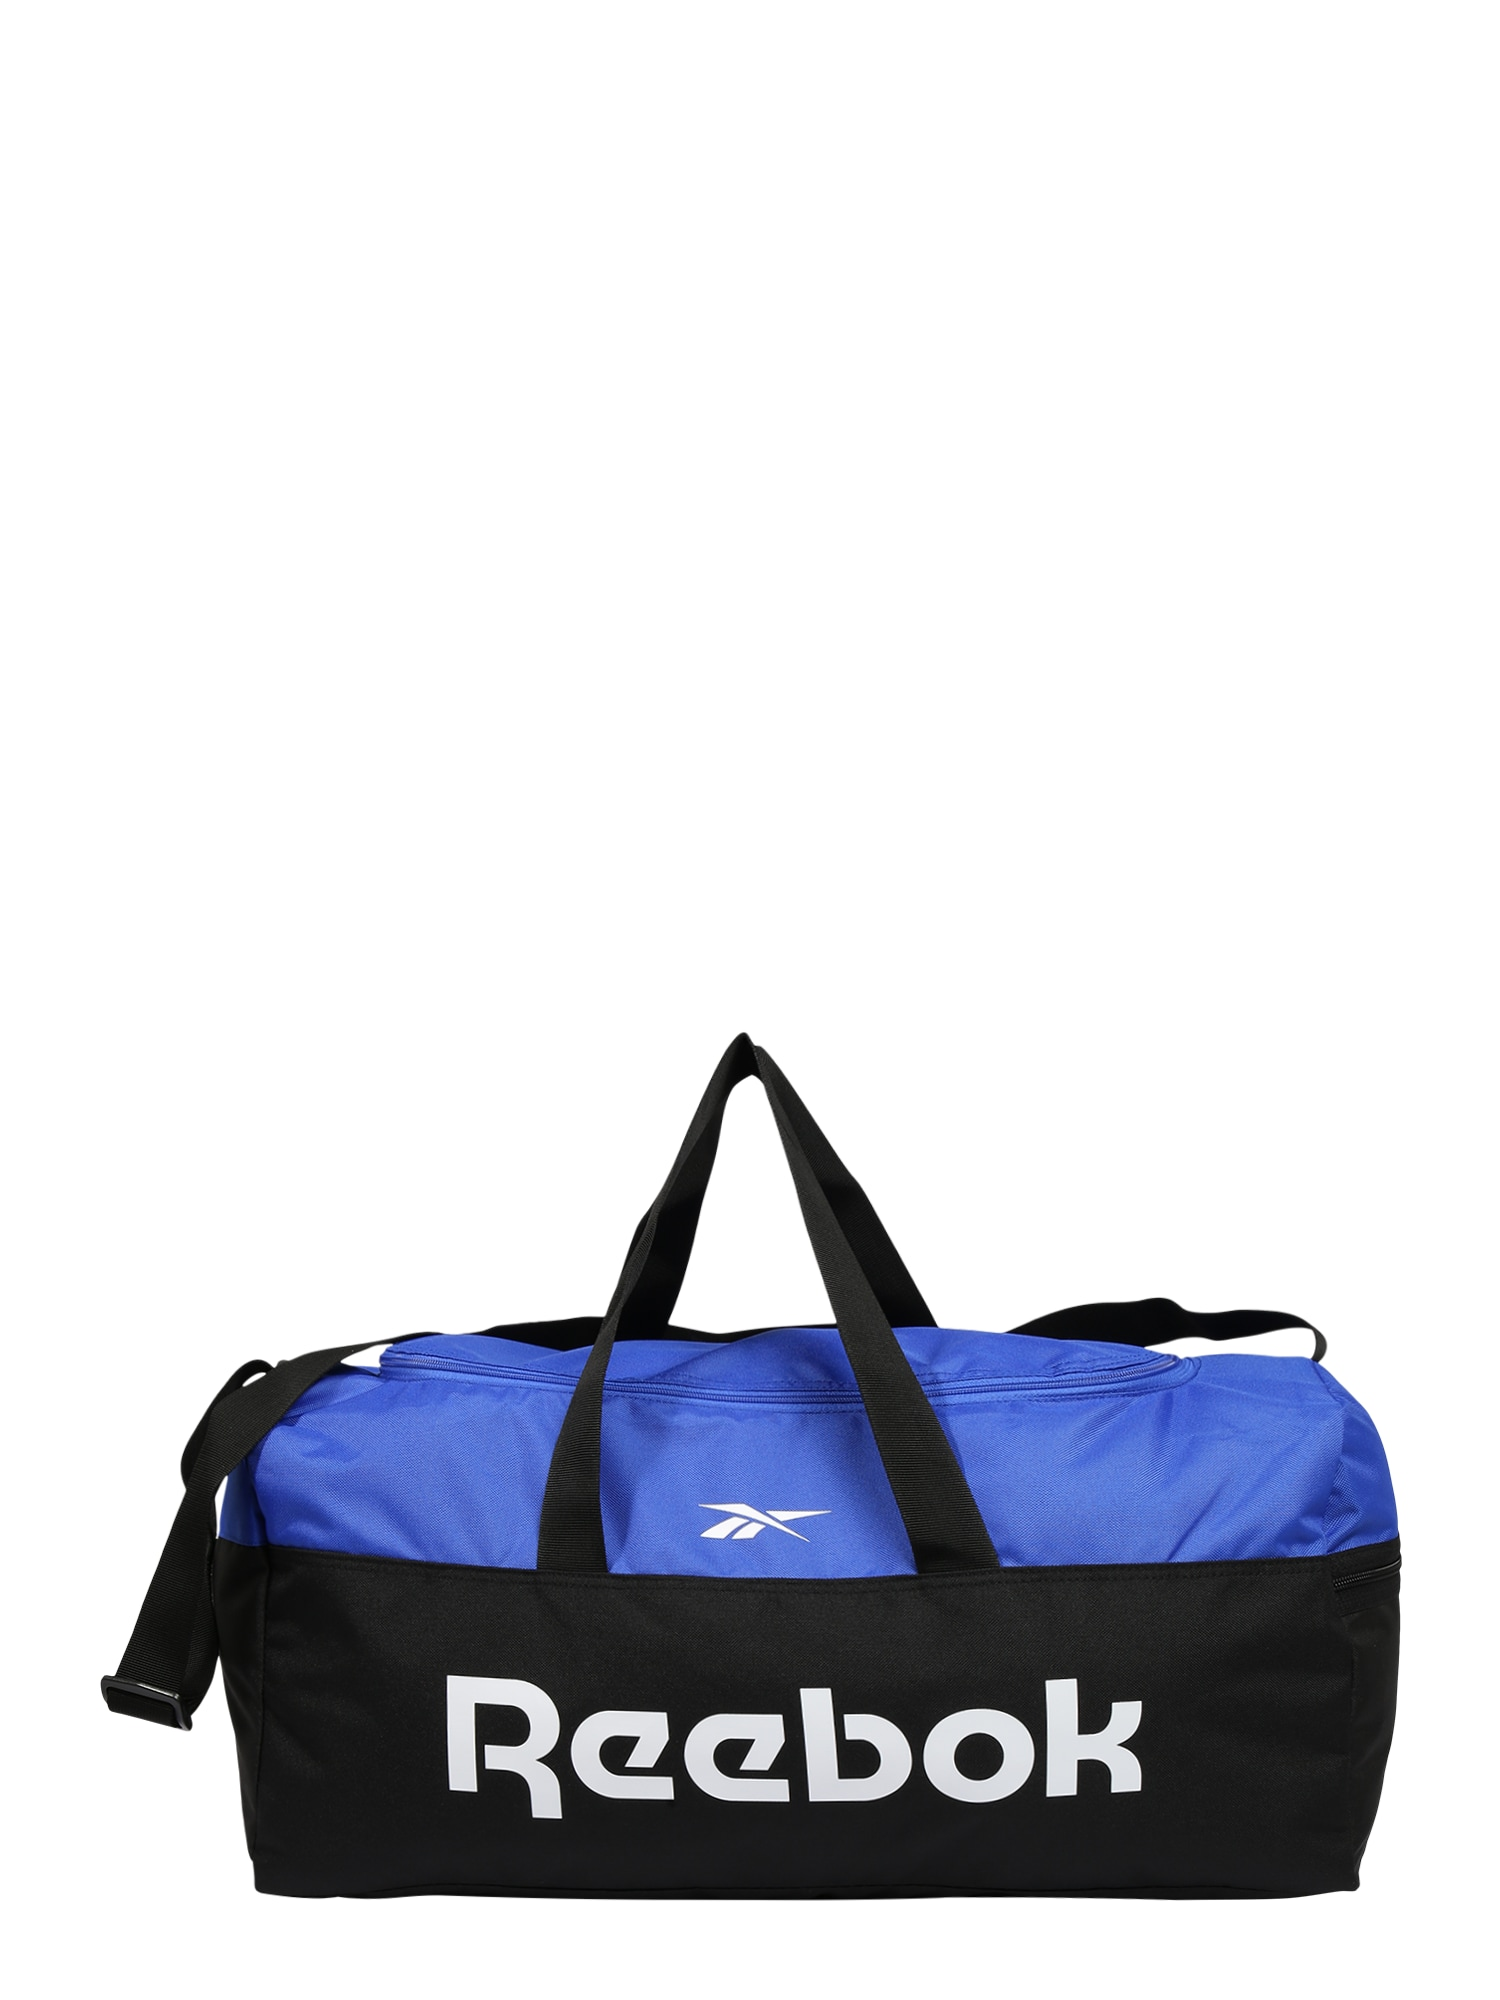 Reebok Classic Krepšys juoda / mėlyna / balta